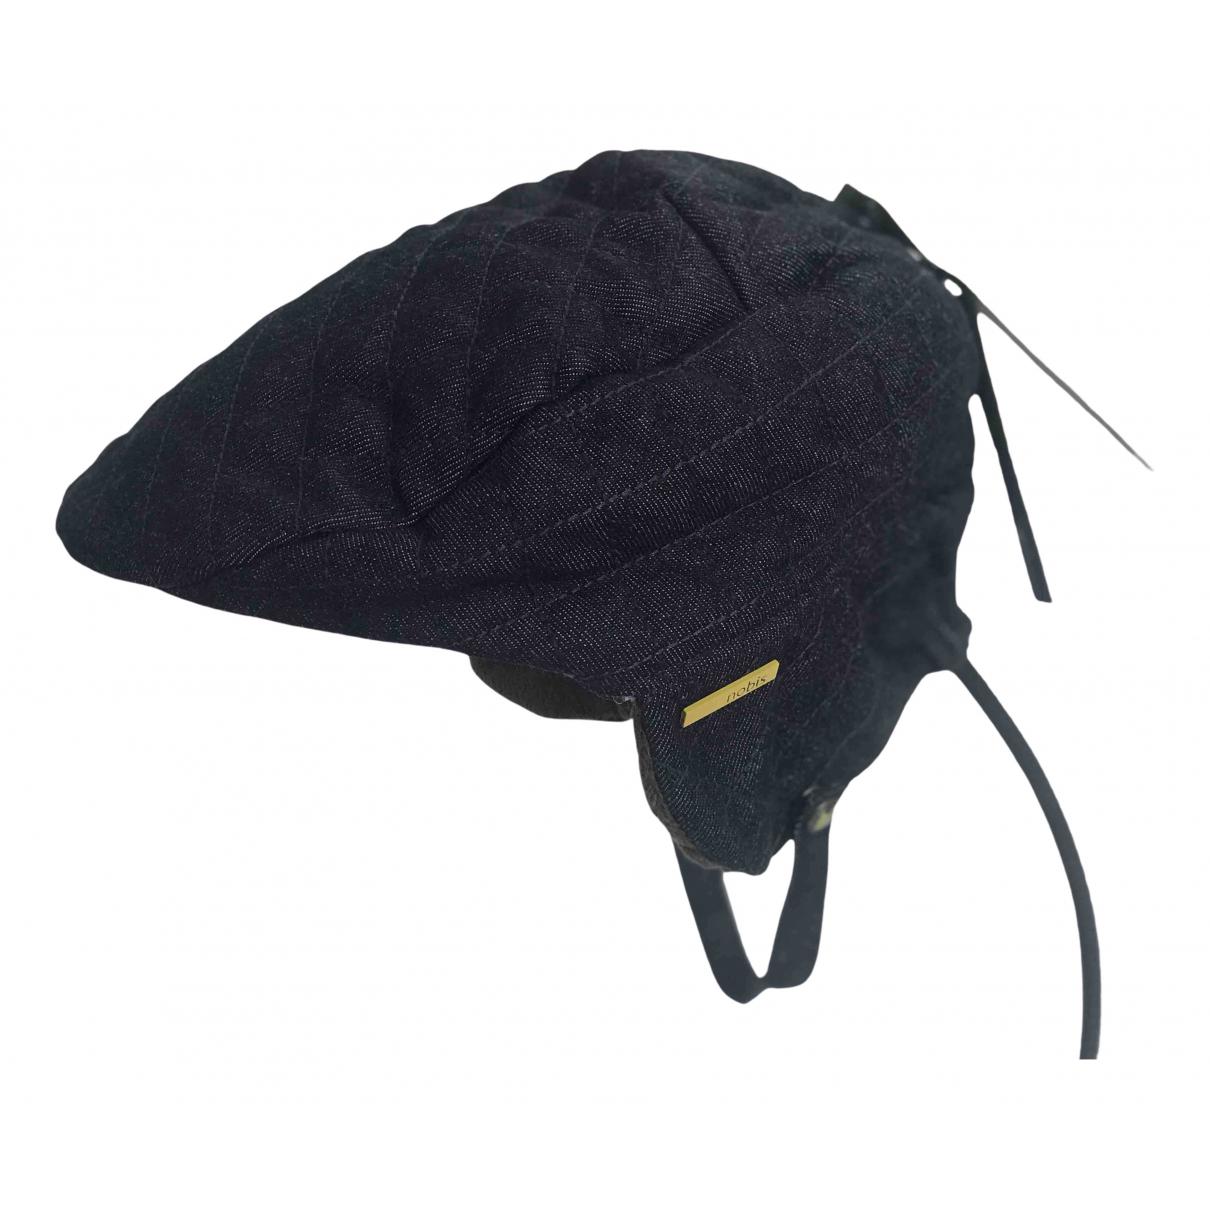 Nobis \N Blue Cotton hat & pull on hat for Men M International